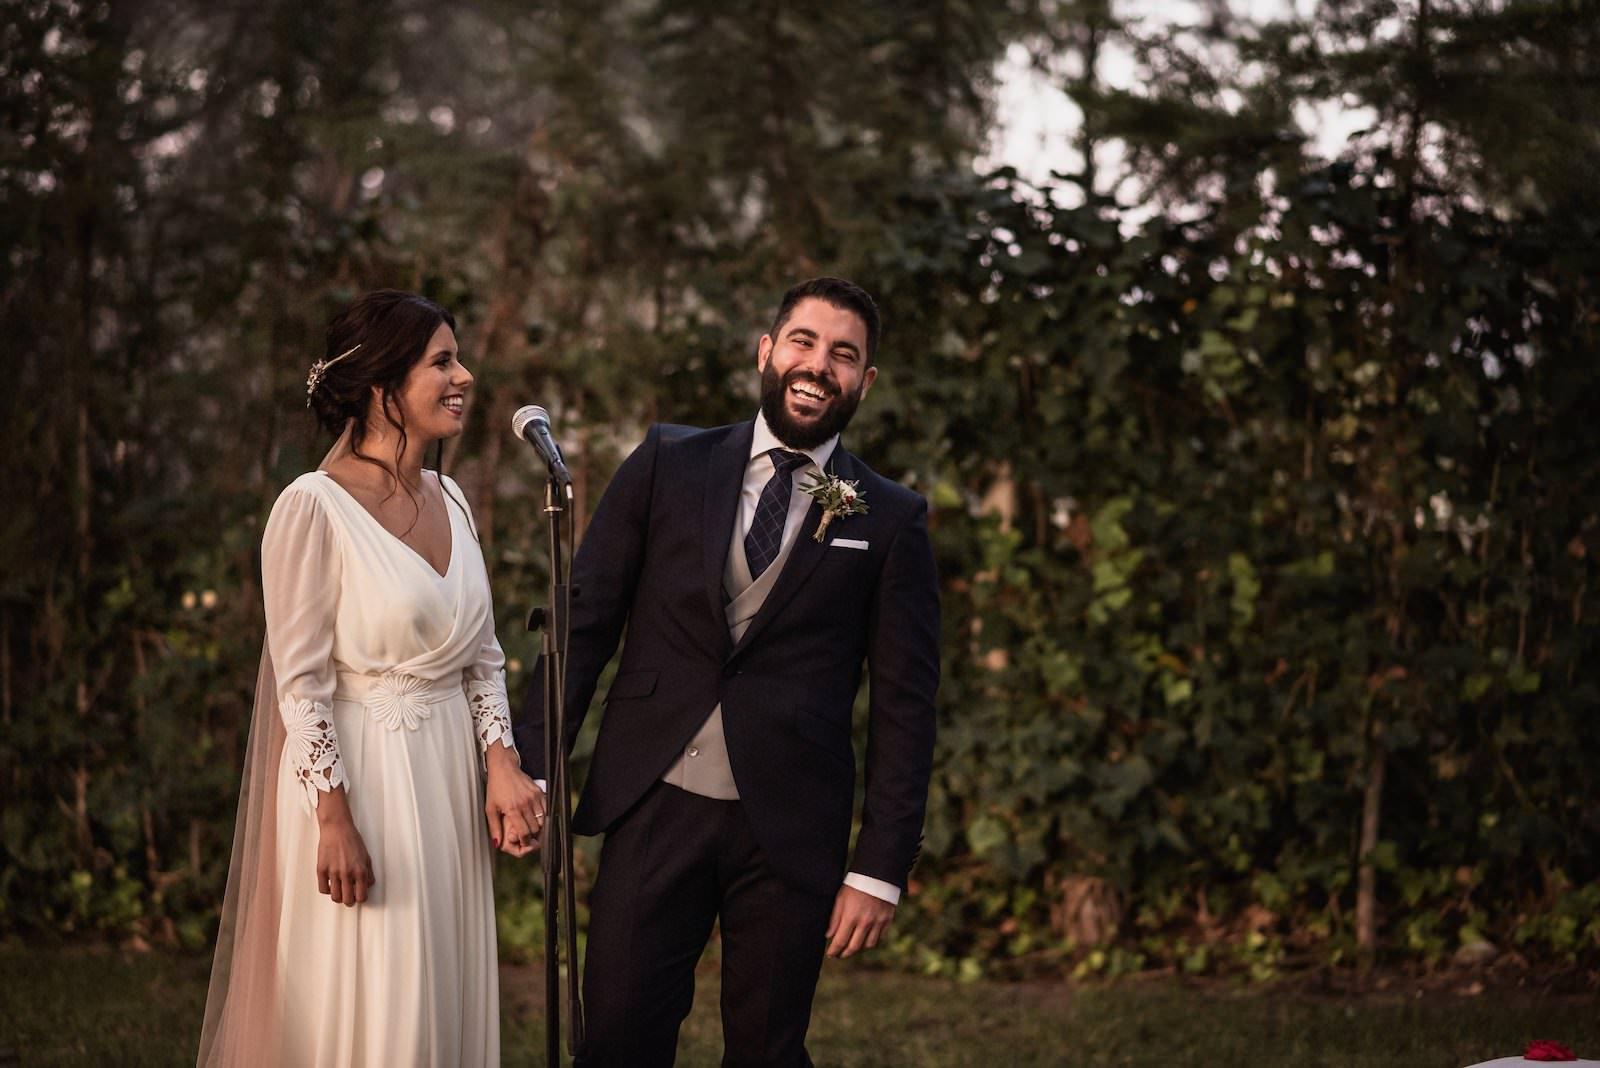 fotografia de boda en murcia novios paseando jardín